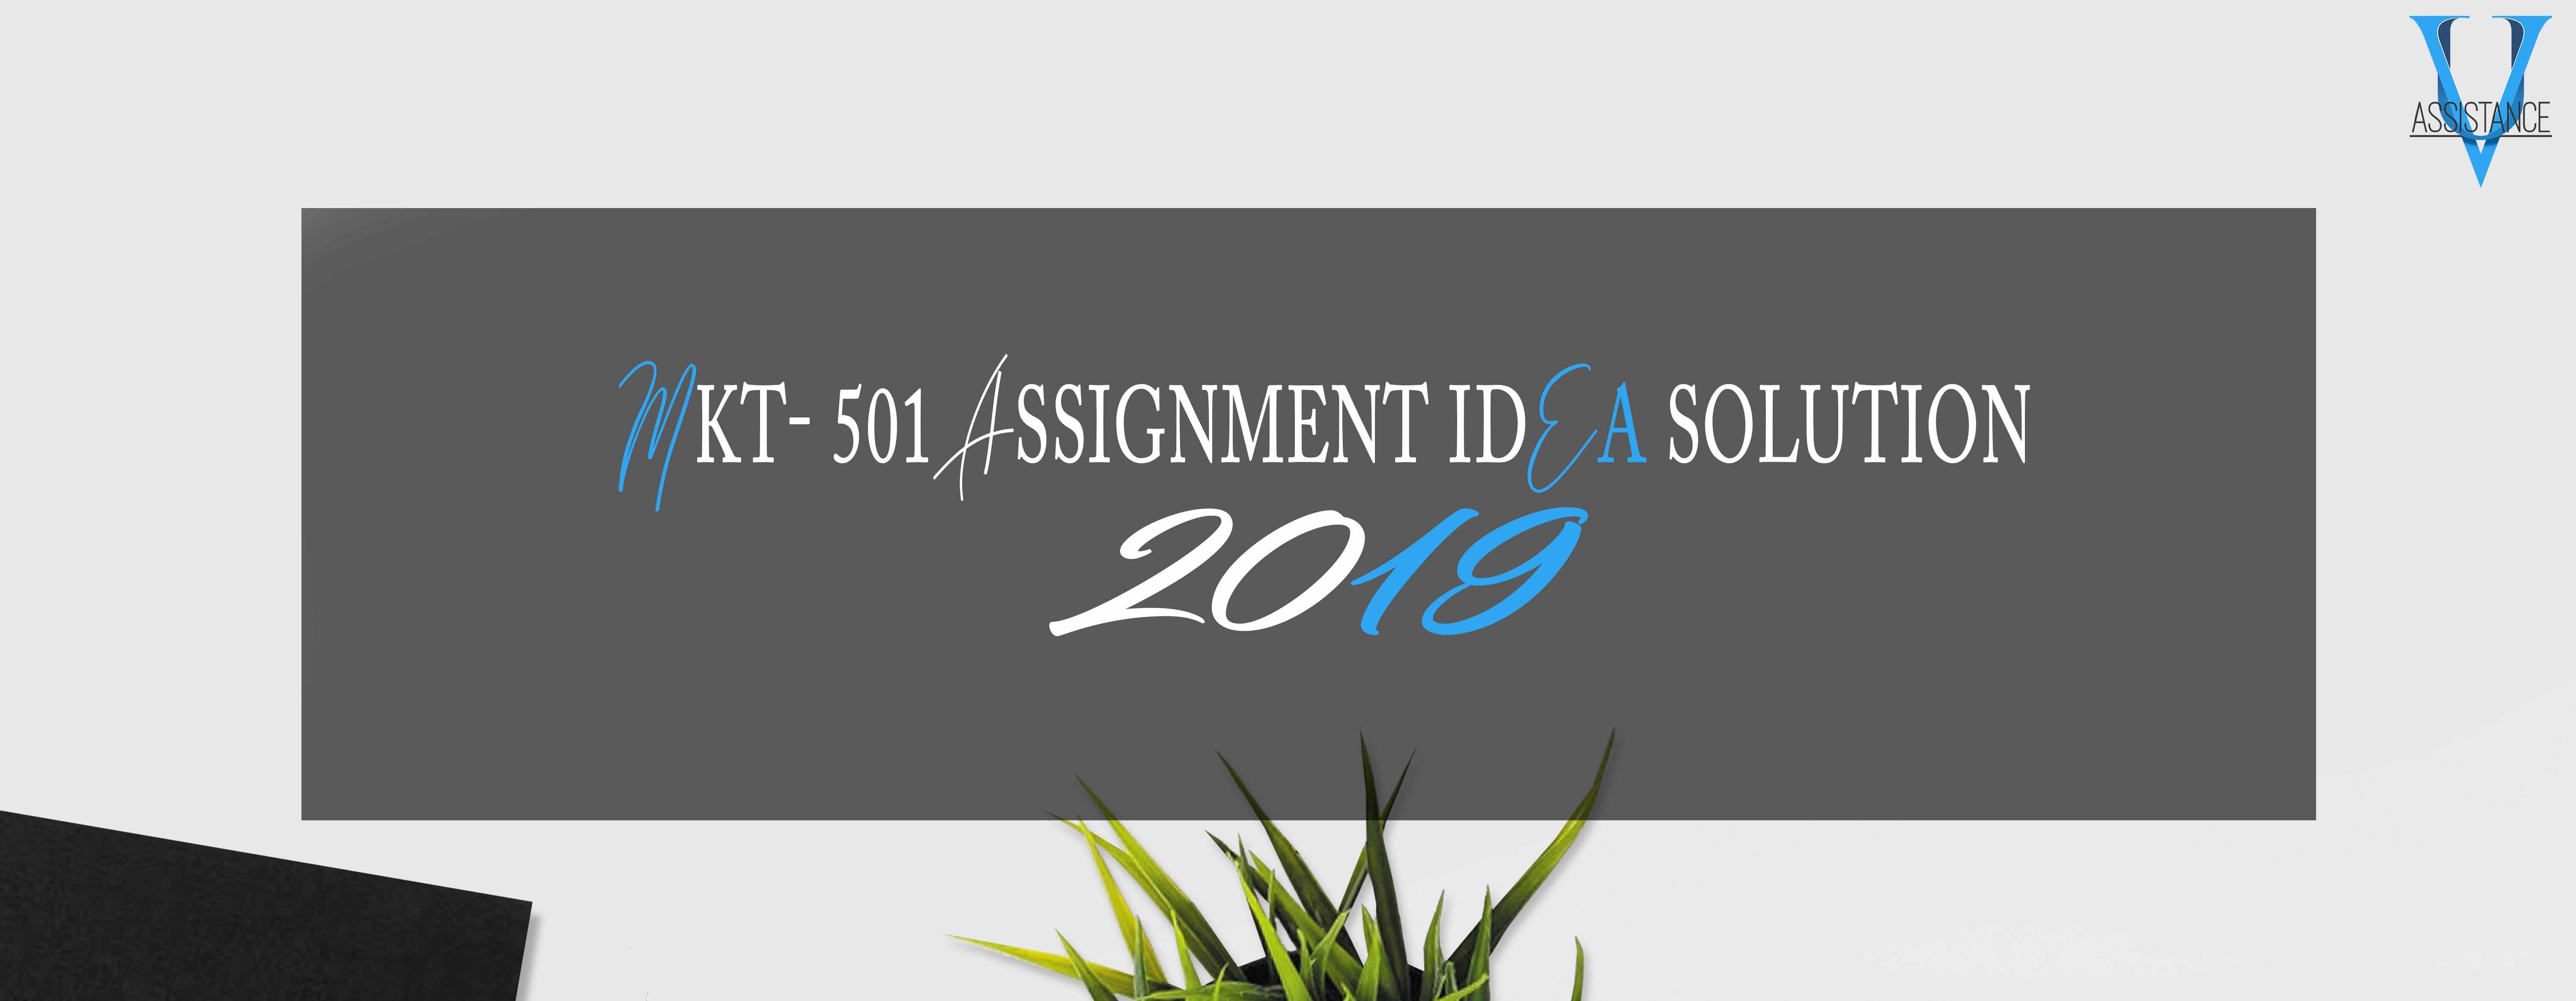 Mkt501 Assignment 1 Solution 2019